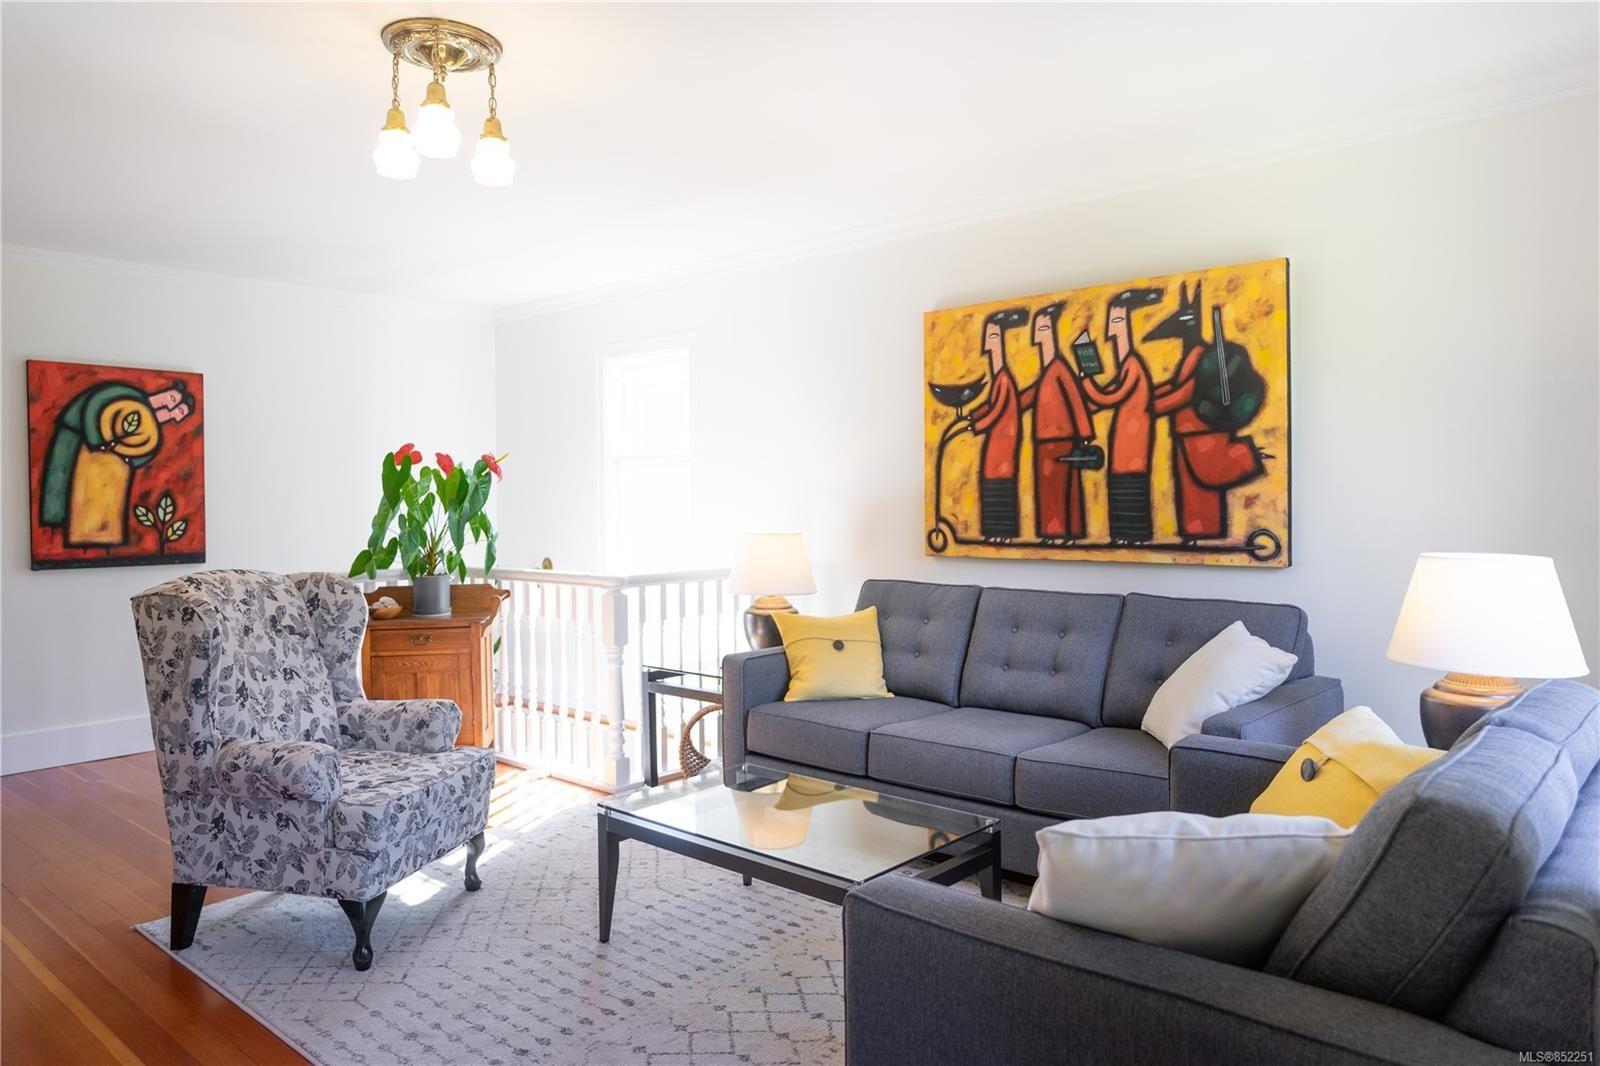 Photo 11: Photos: 2363 Pacific Ave in : OB Estevan House for sale (Oak Bay)  : MLS®# 852251